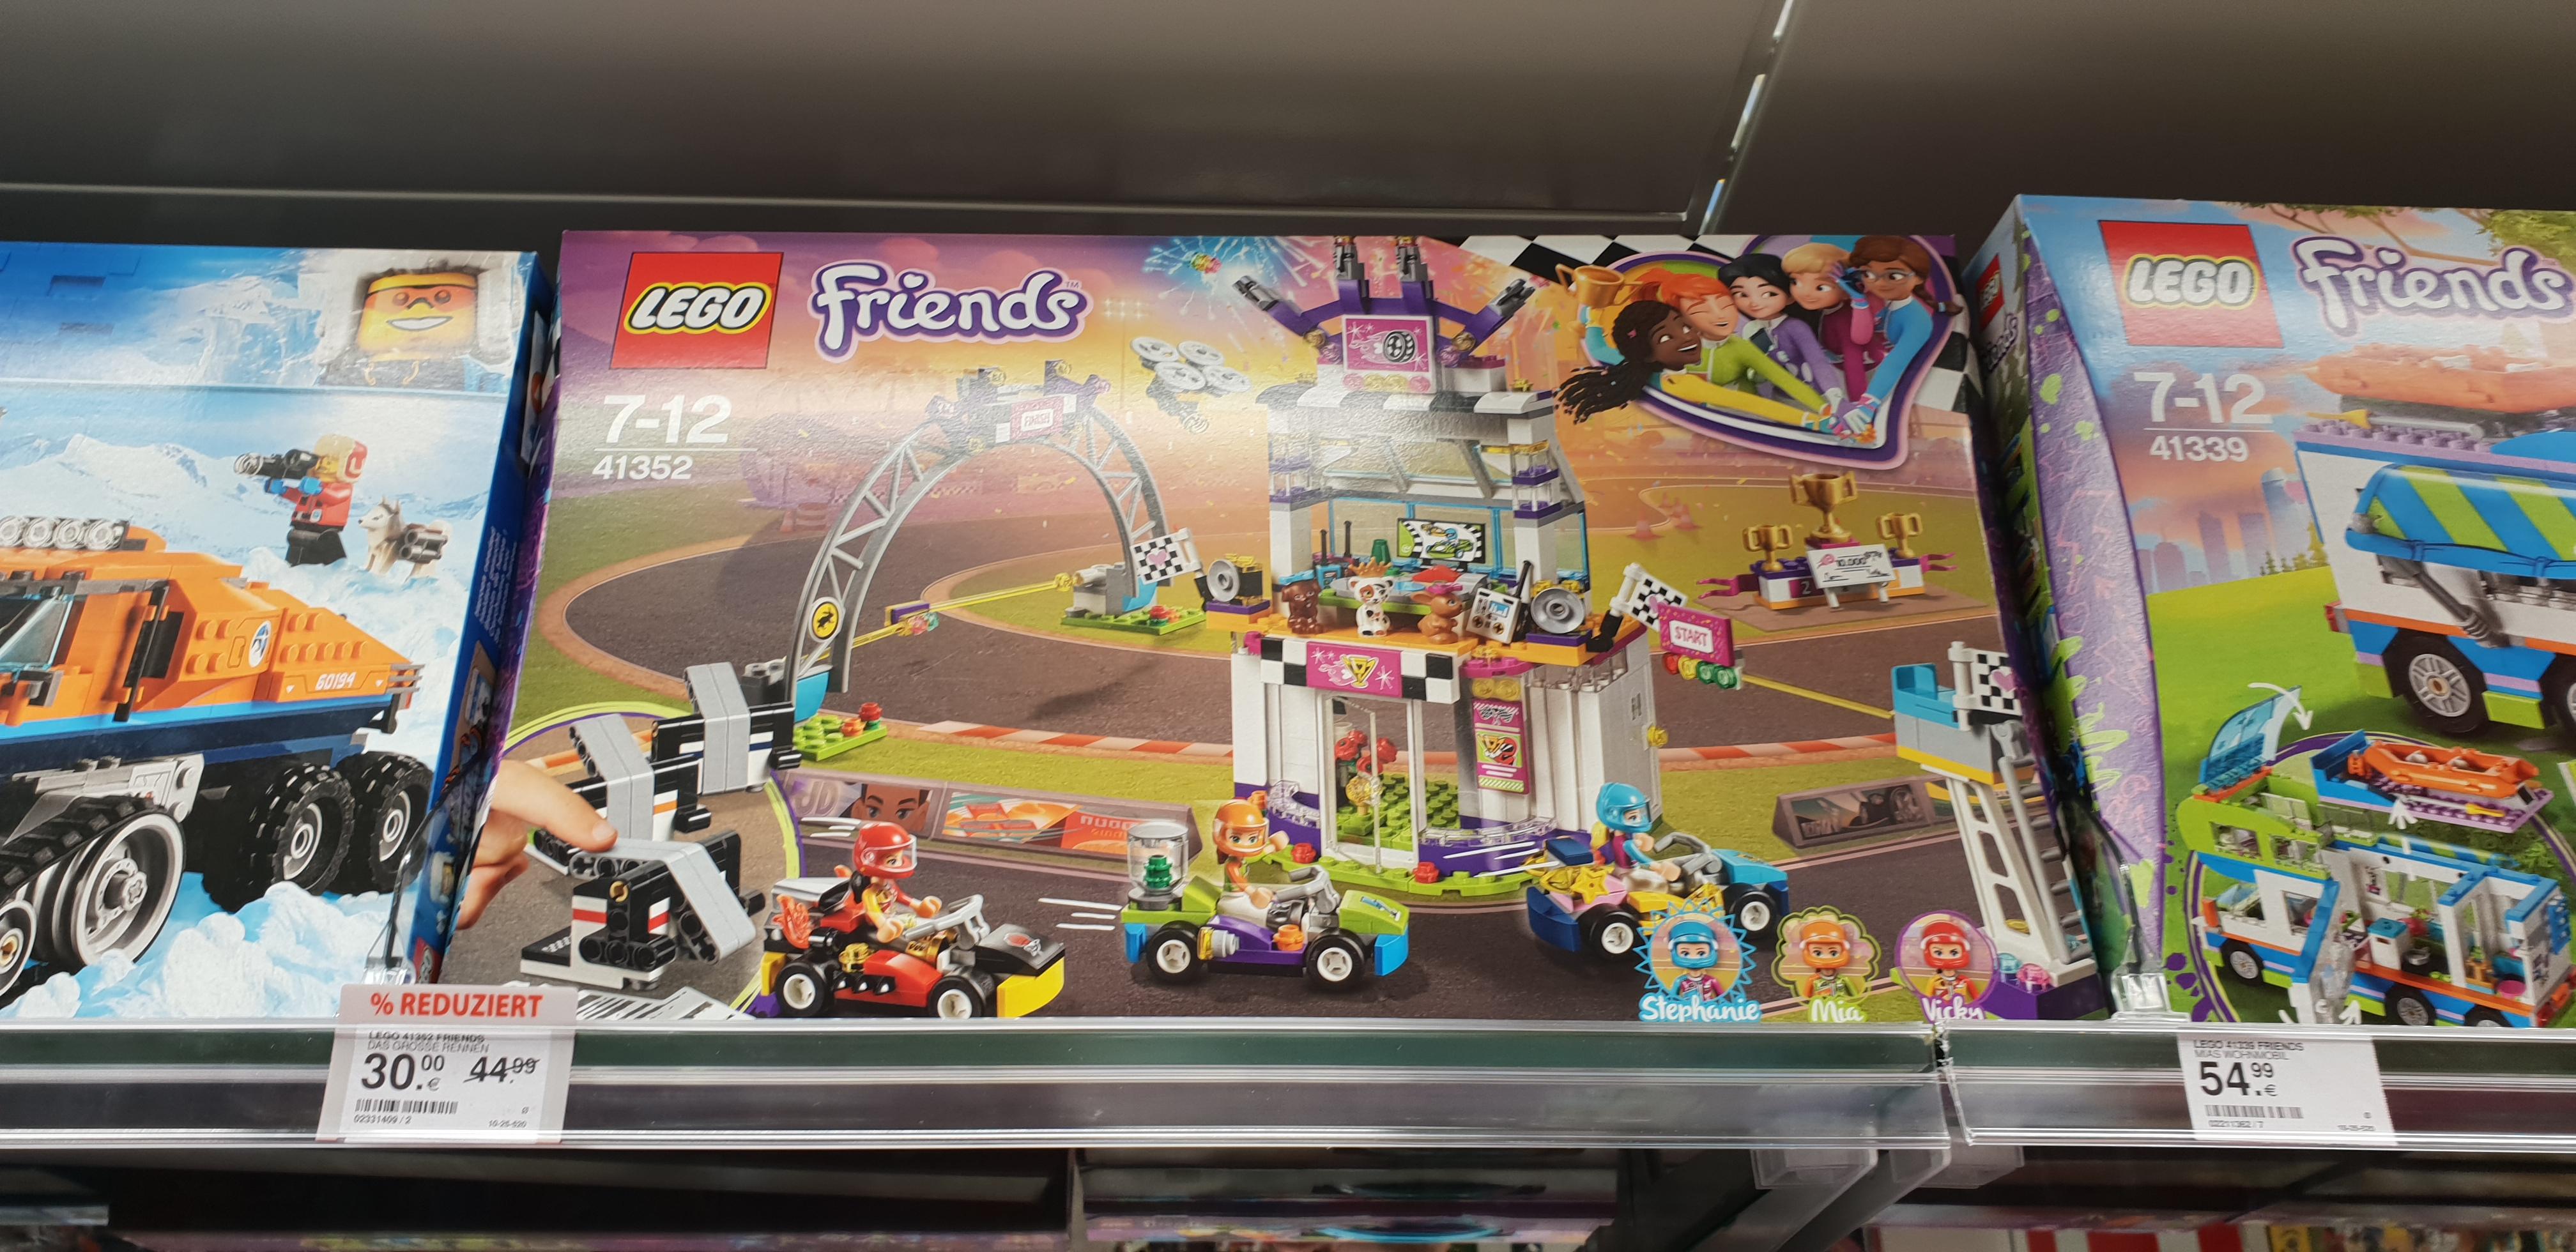 [Müller Berlin Gropius Passagen] LEGO Friends - Das große Rennen (41352)